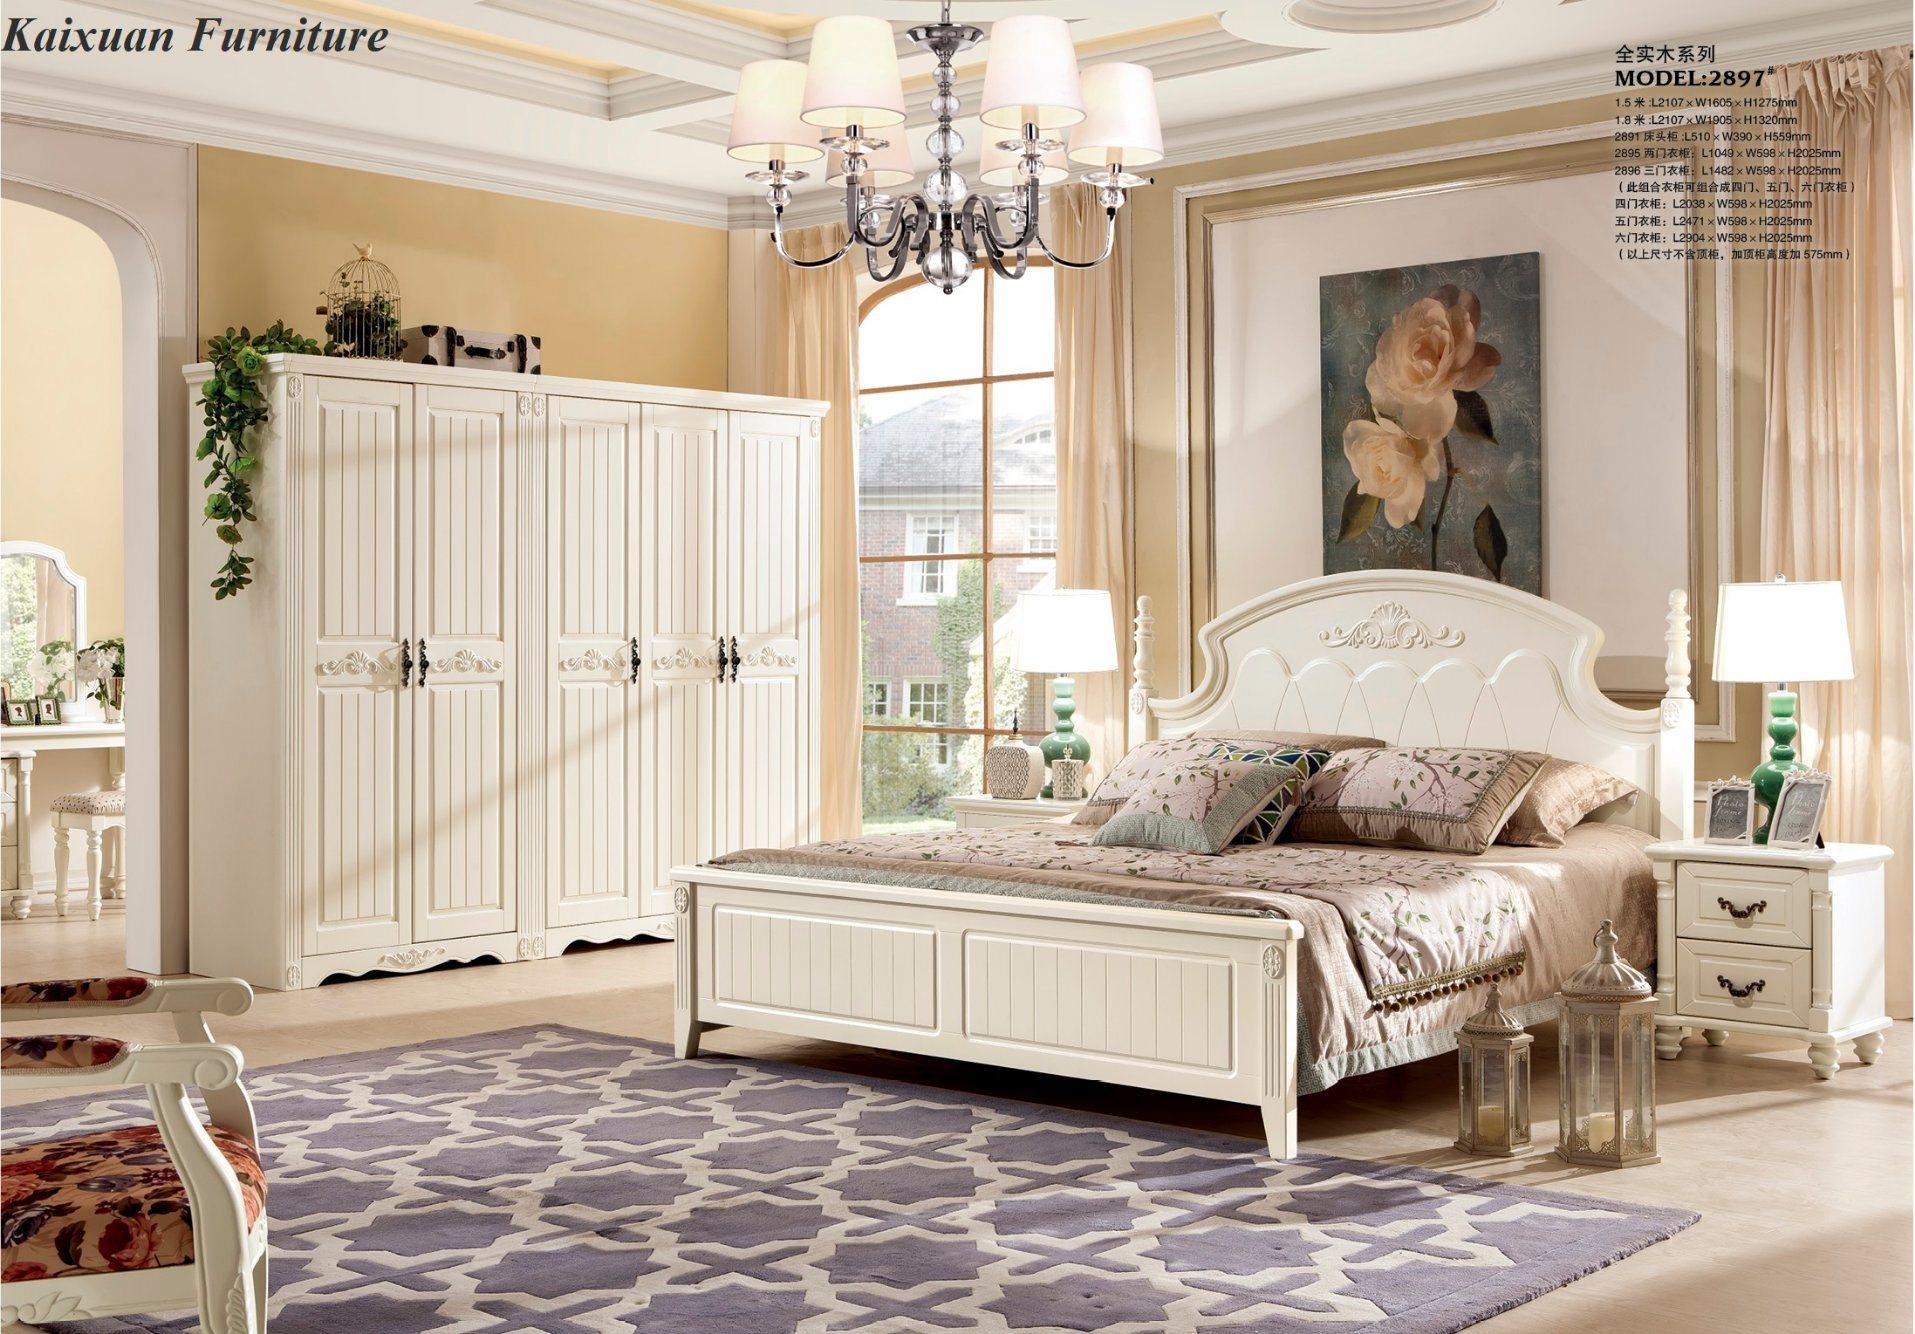 China Foshan Antique Solid Wood Bedroom Furniture Set In King Size China Bedroom Furniture Home Furniture